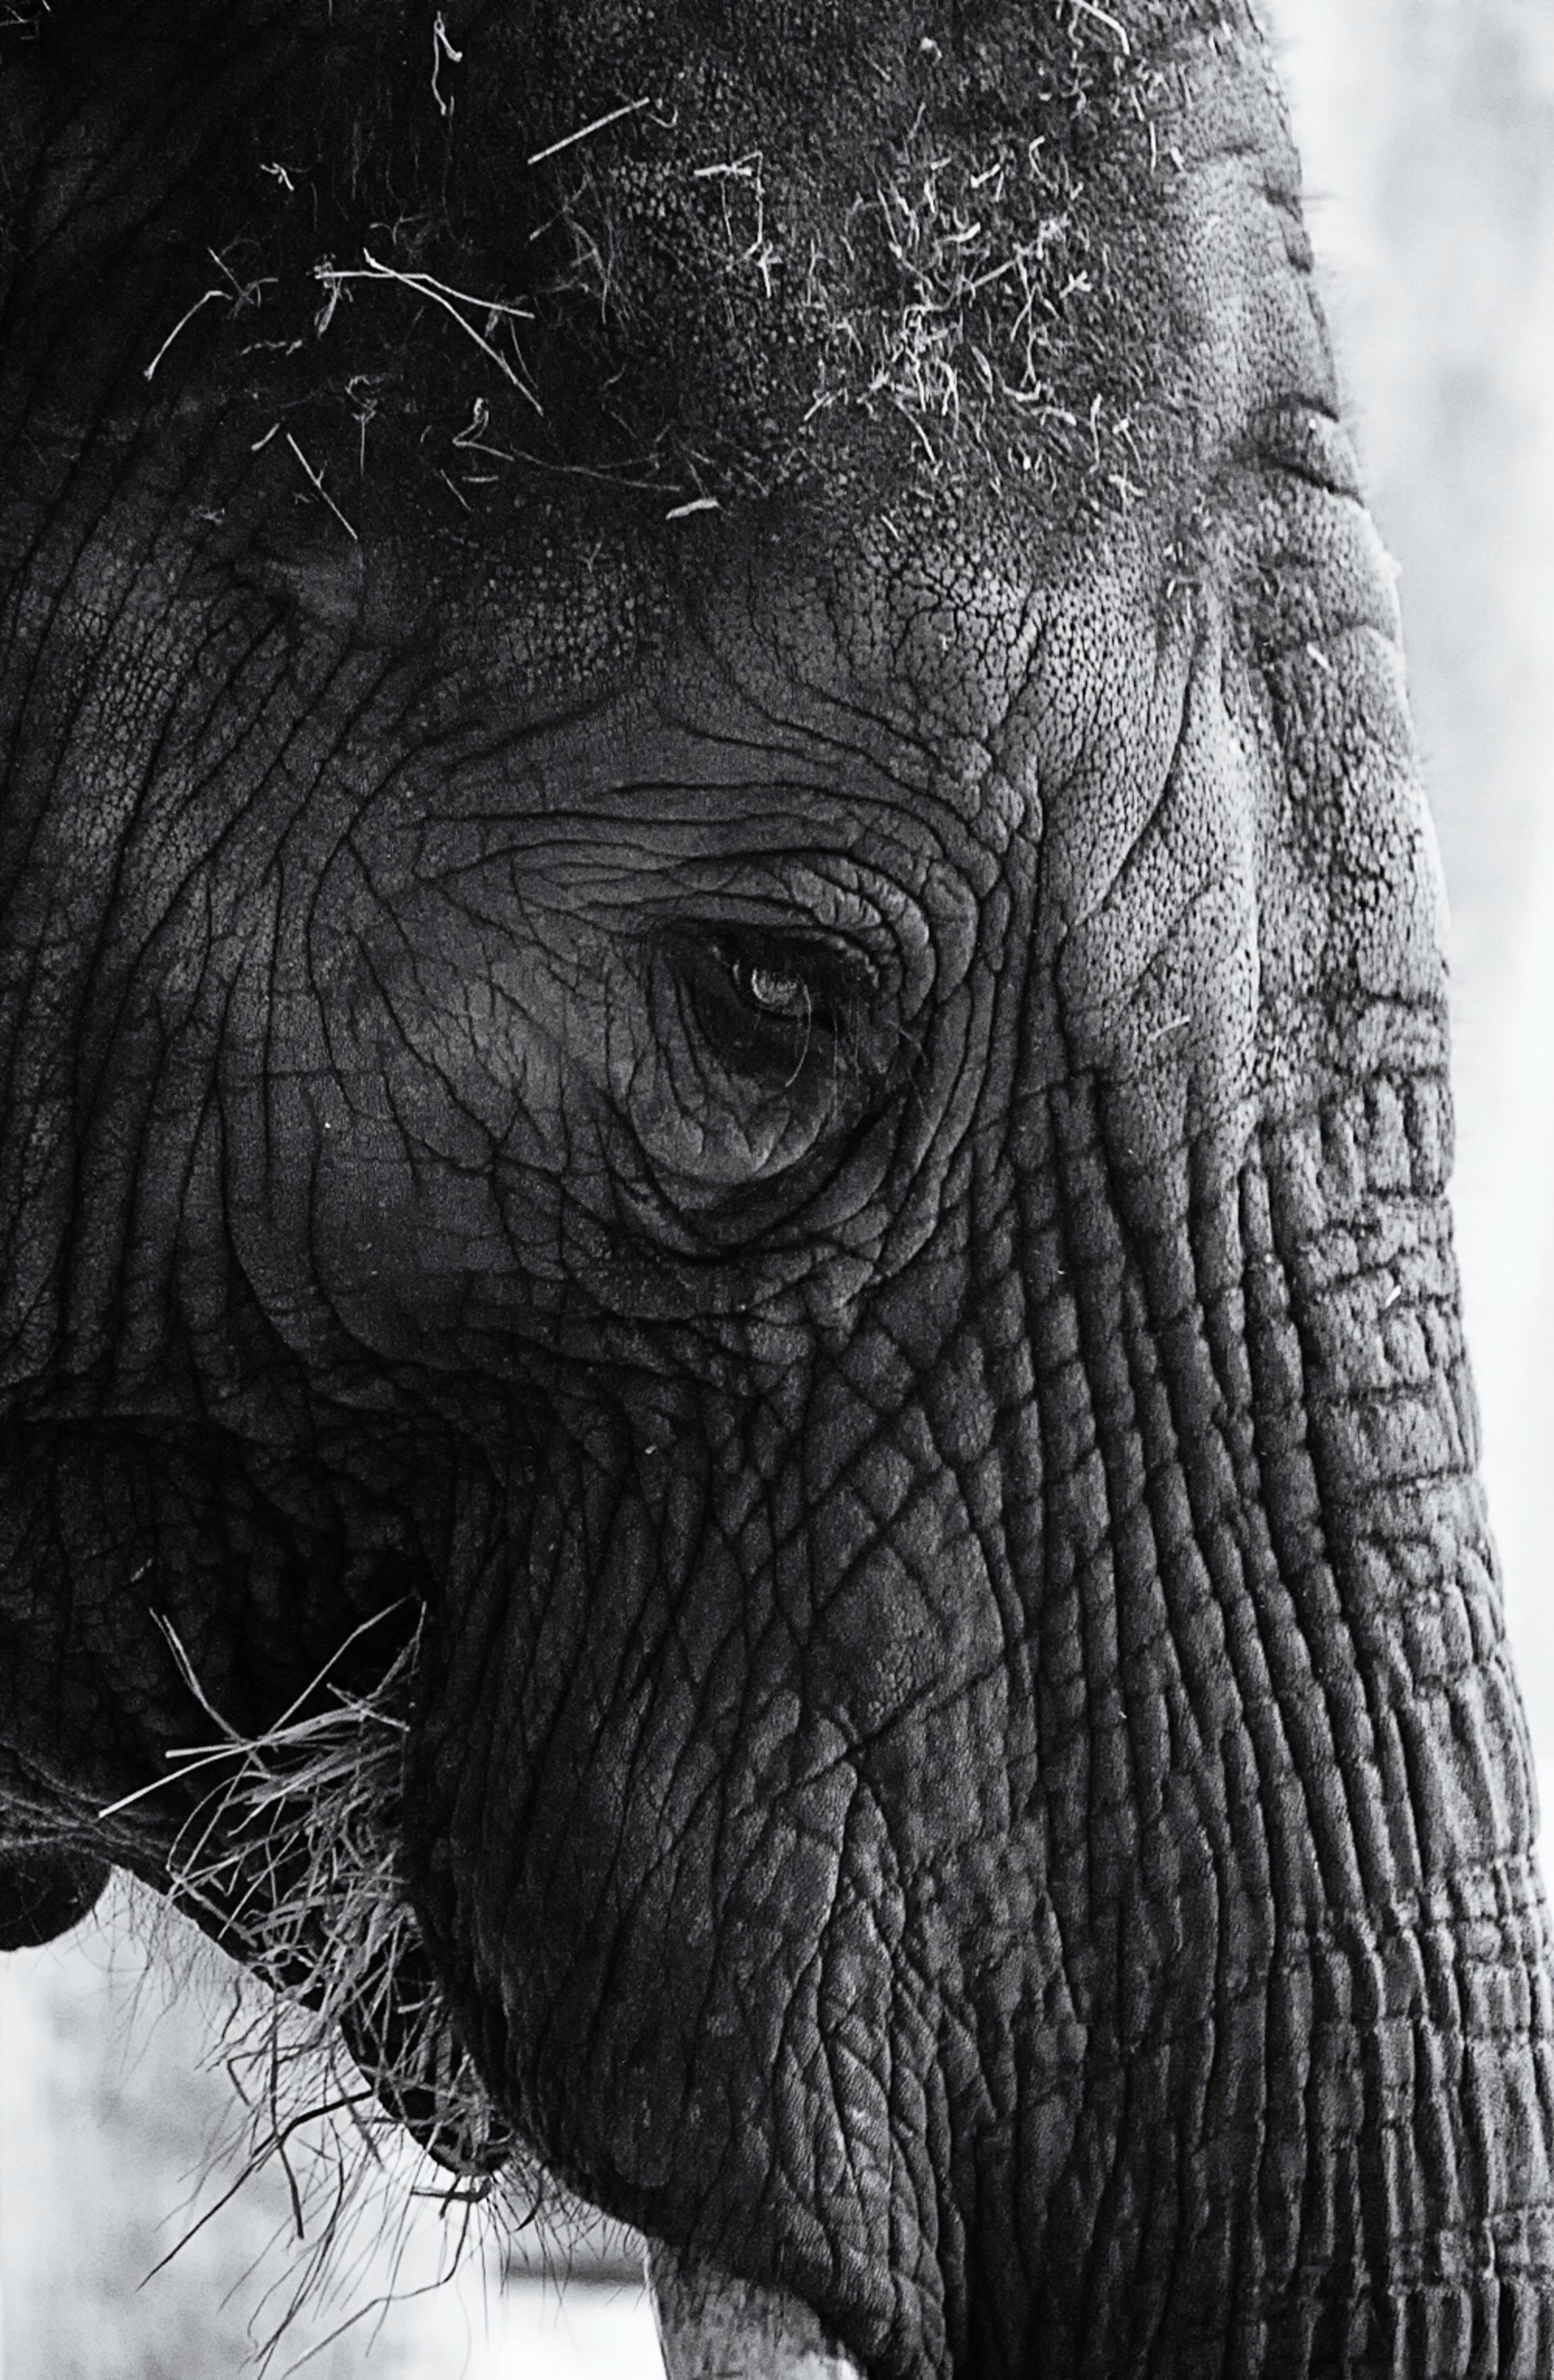 Olifant in Safaripark Beekse Bergen - Olifant in Safaripark Beekse Bergen - foto door canon85 op 29-02-2016 - deze foto bevat: dierentuin, dieren, safari, olifant, afrika, wildlife